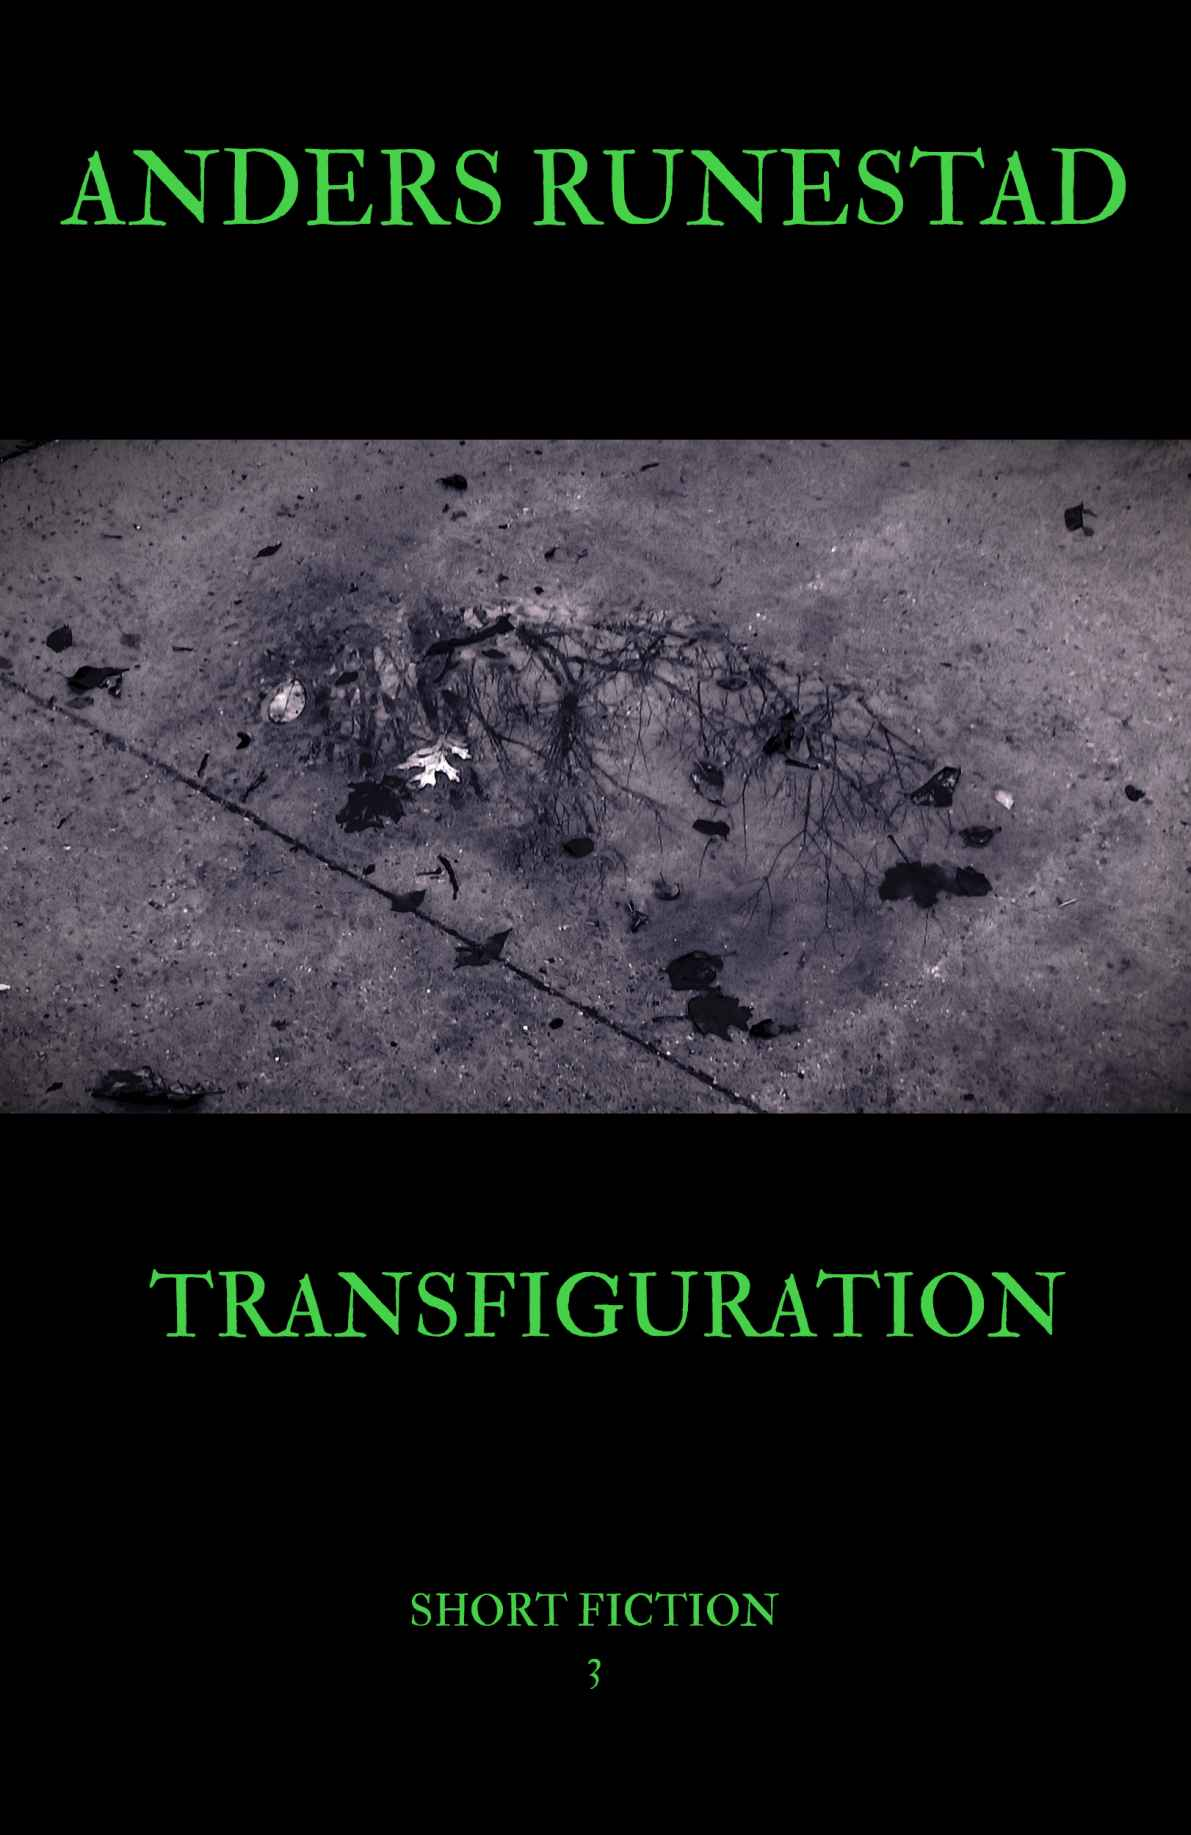 (29) Transfiguration